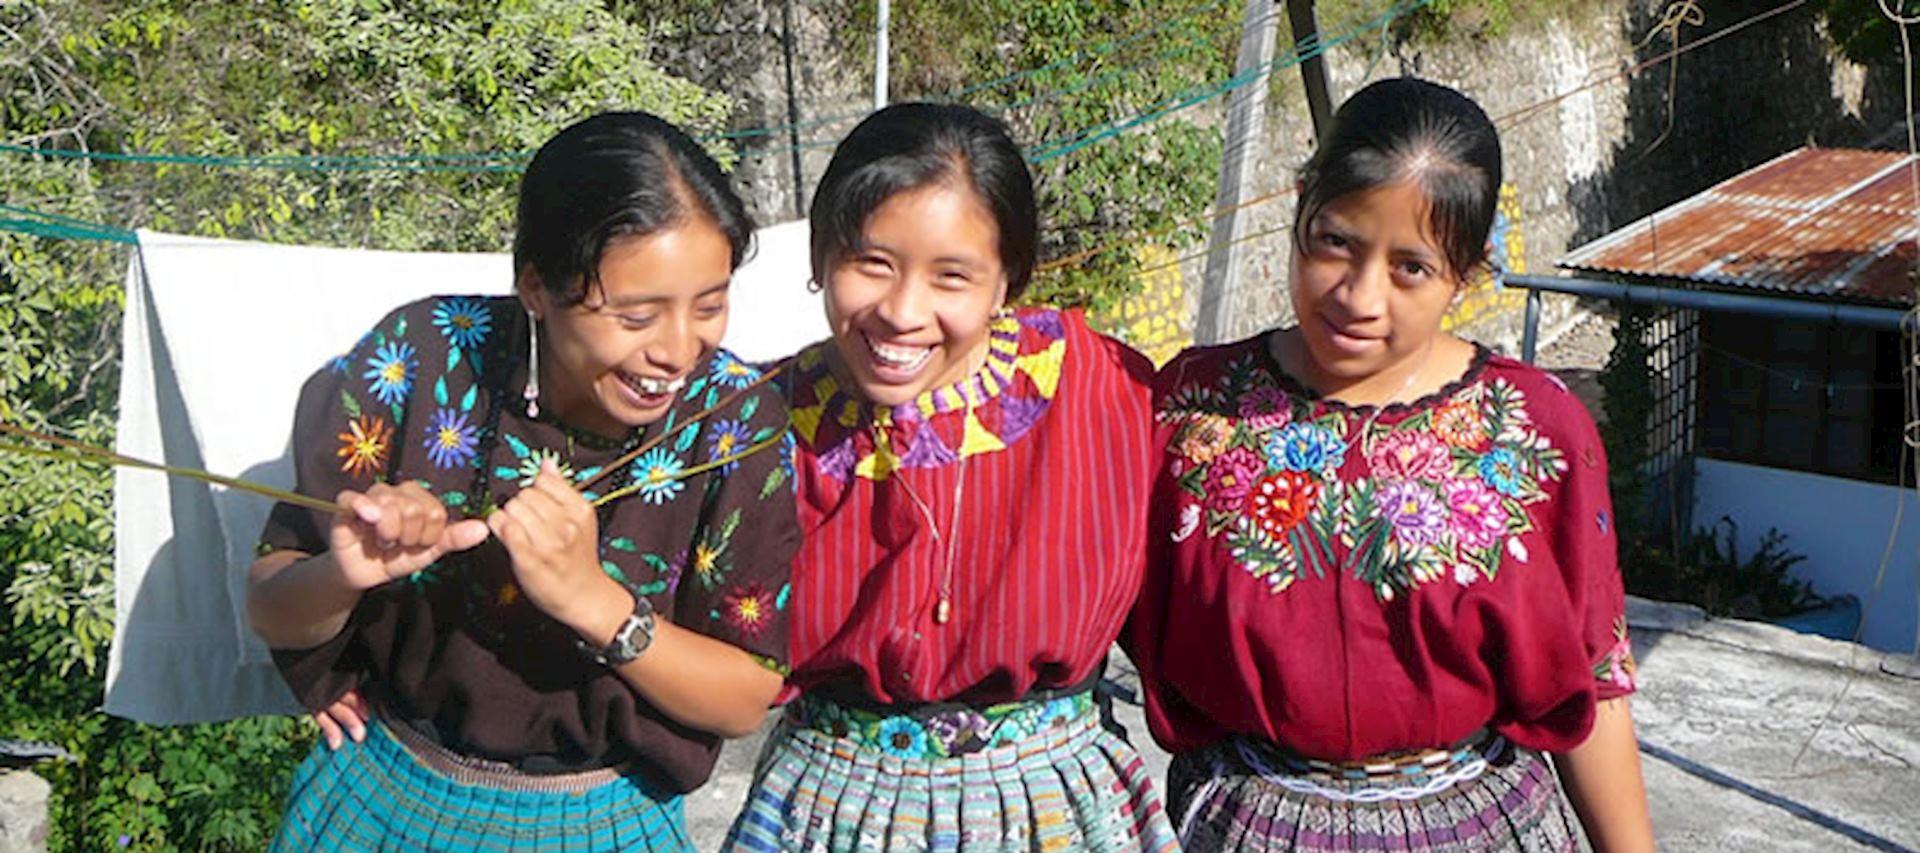 The charity Amigos de Santa Cruz aims to help young women like these in Santa Cruz La Laguna, Guatemala